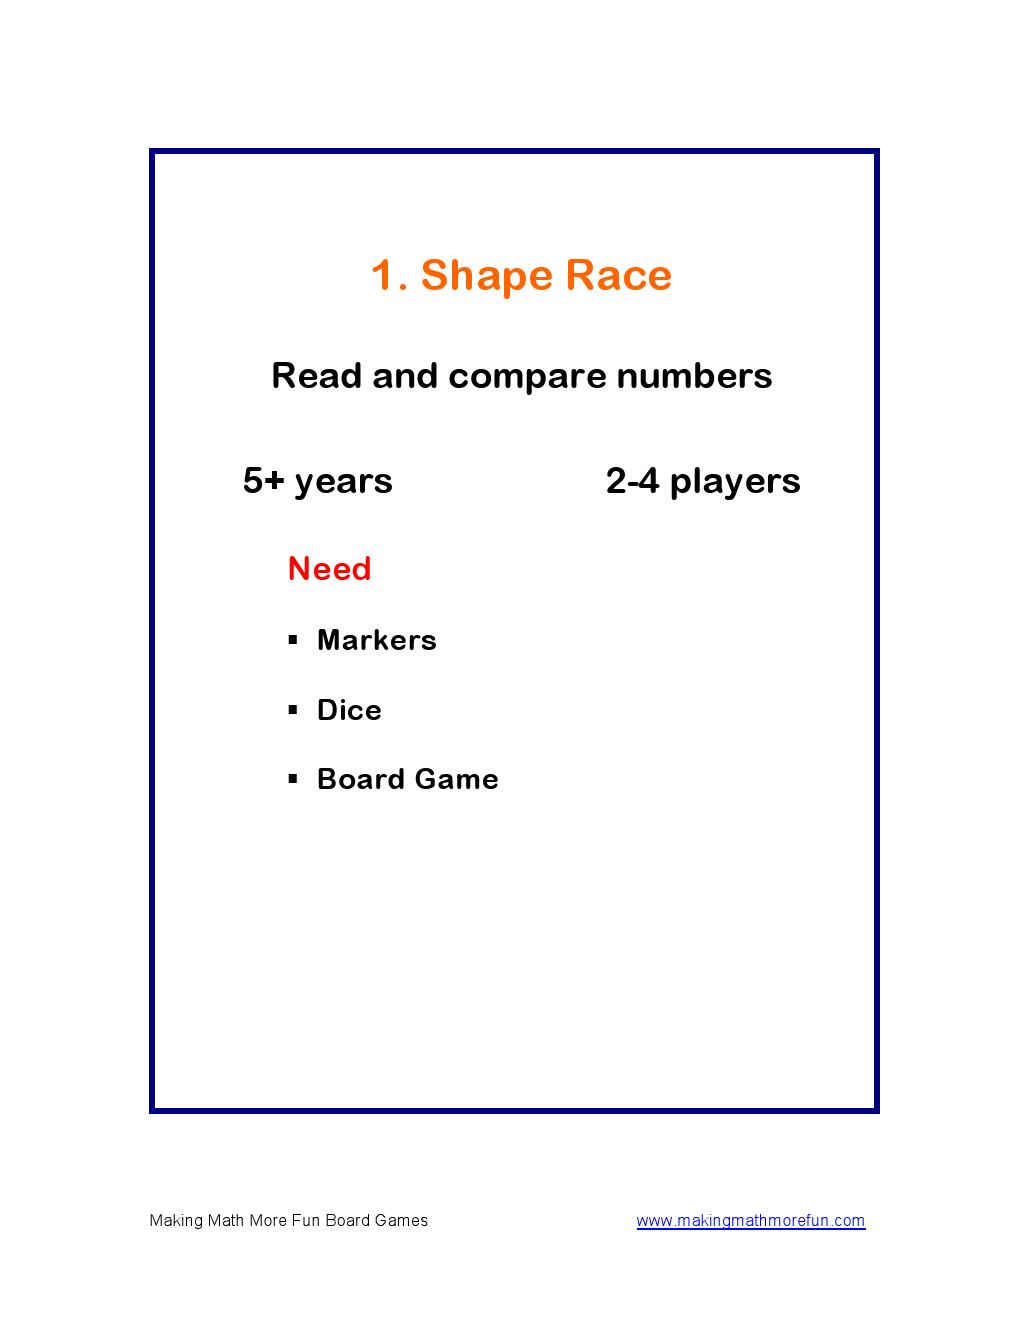 Making Math More Fun Math Board Games for Kids